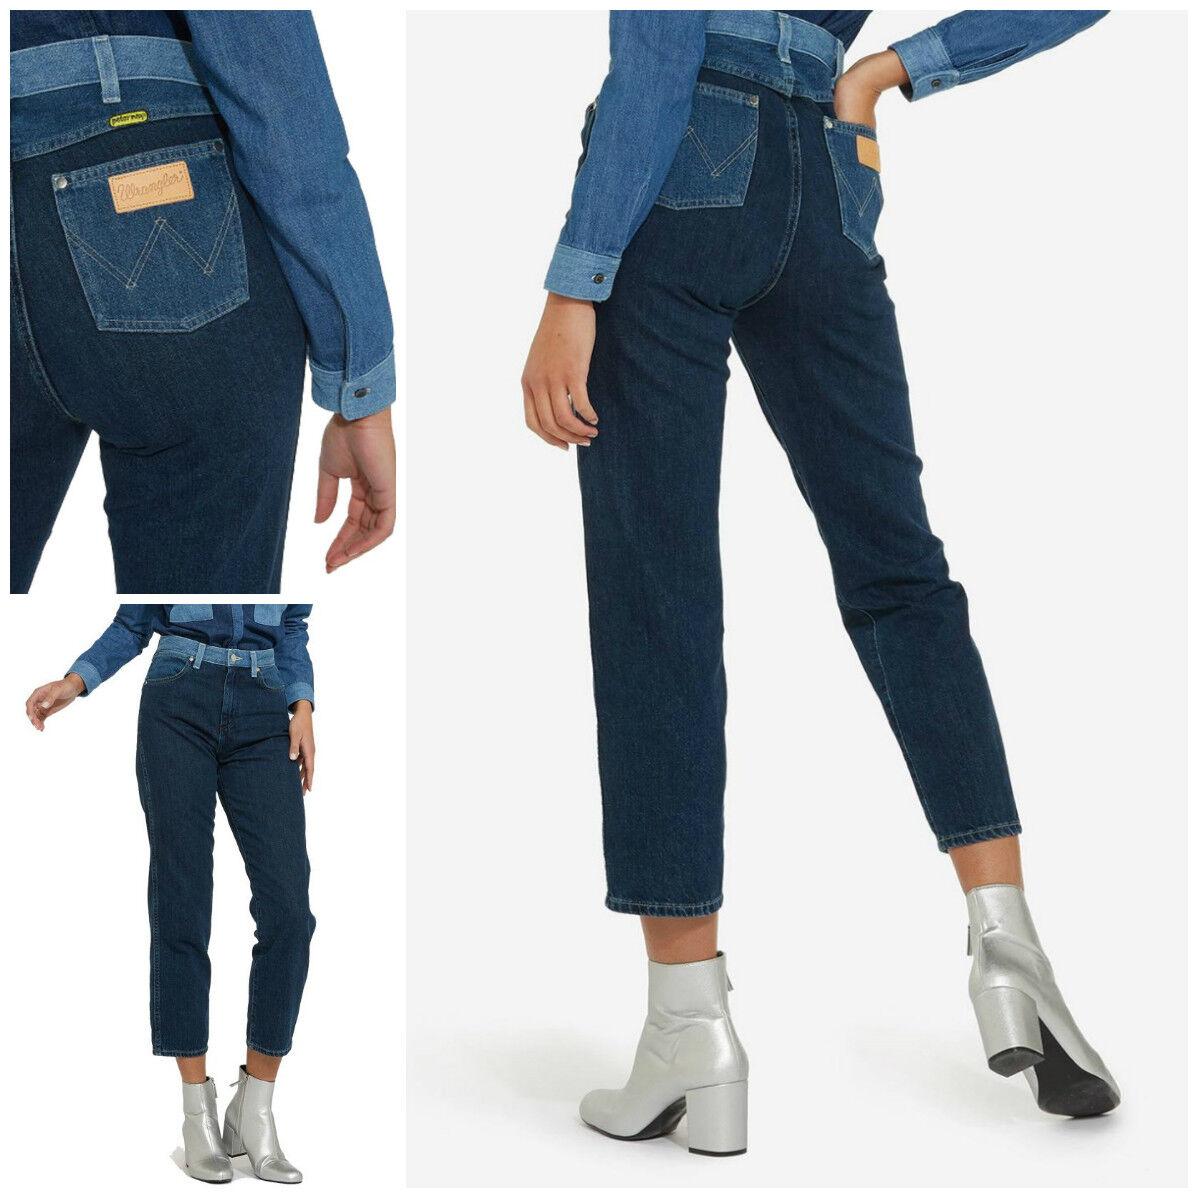 Neu Wrangler X Peter Max Retro Gerade Jeans Boyfriend Ausschnitt Mama